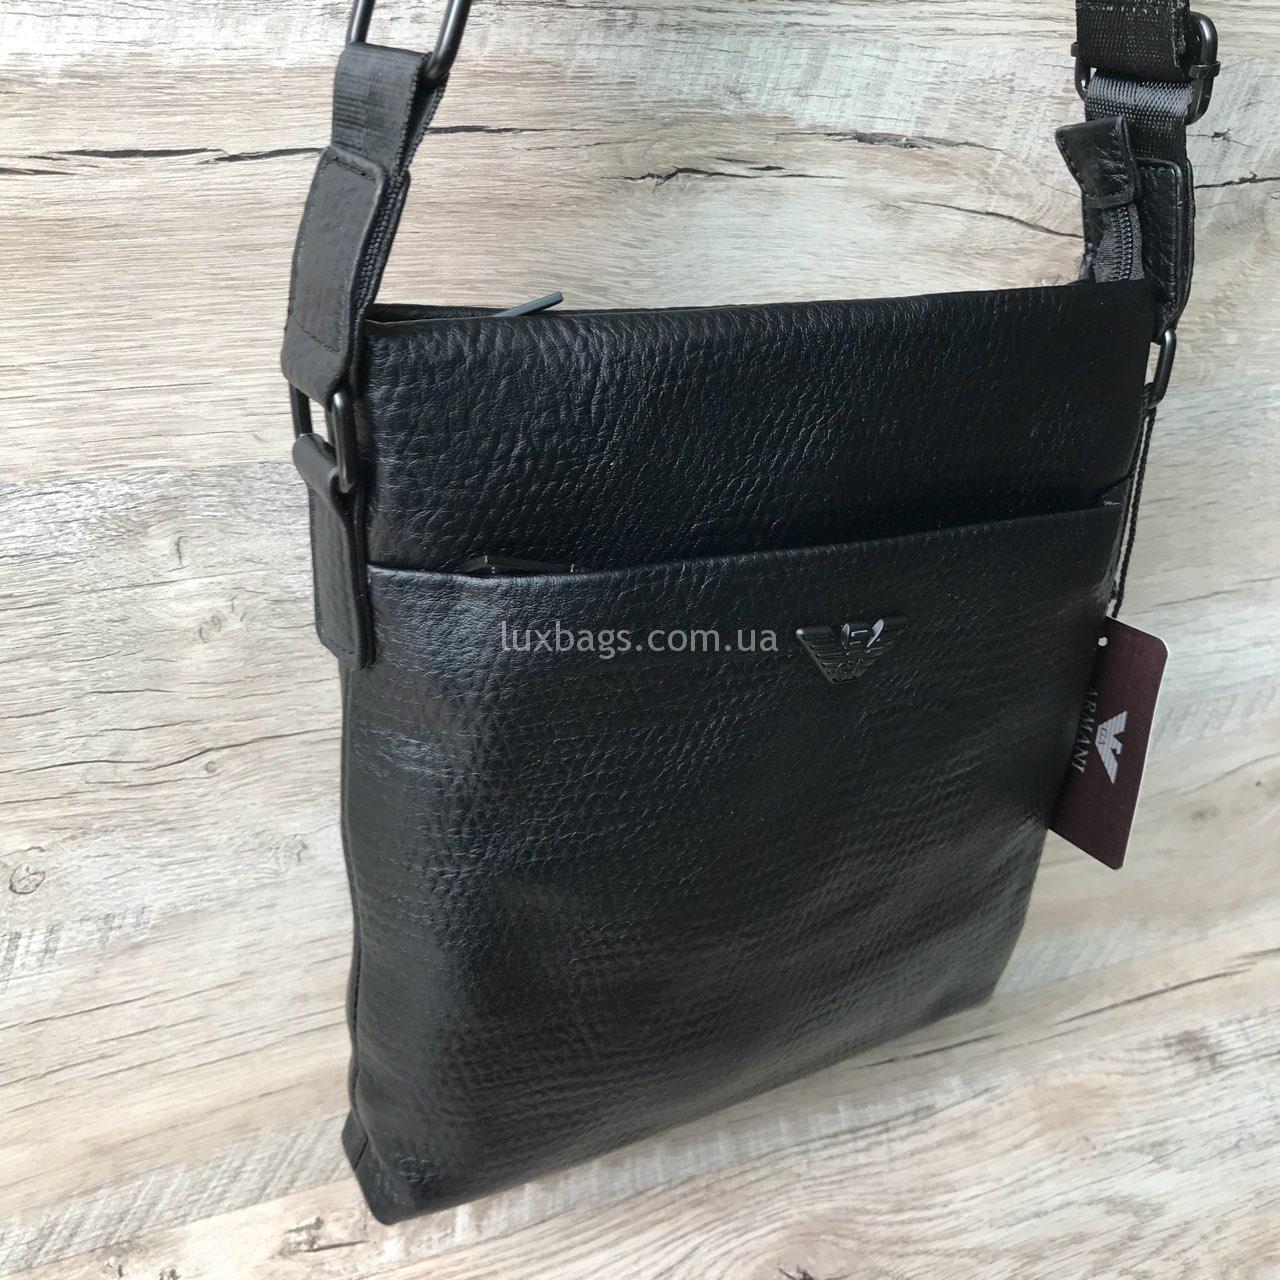 cd44df68807d Мужская сумка Armani (Армани) через плечо Купить Недорого